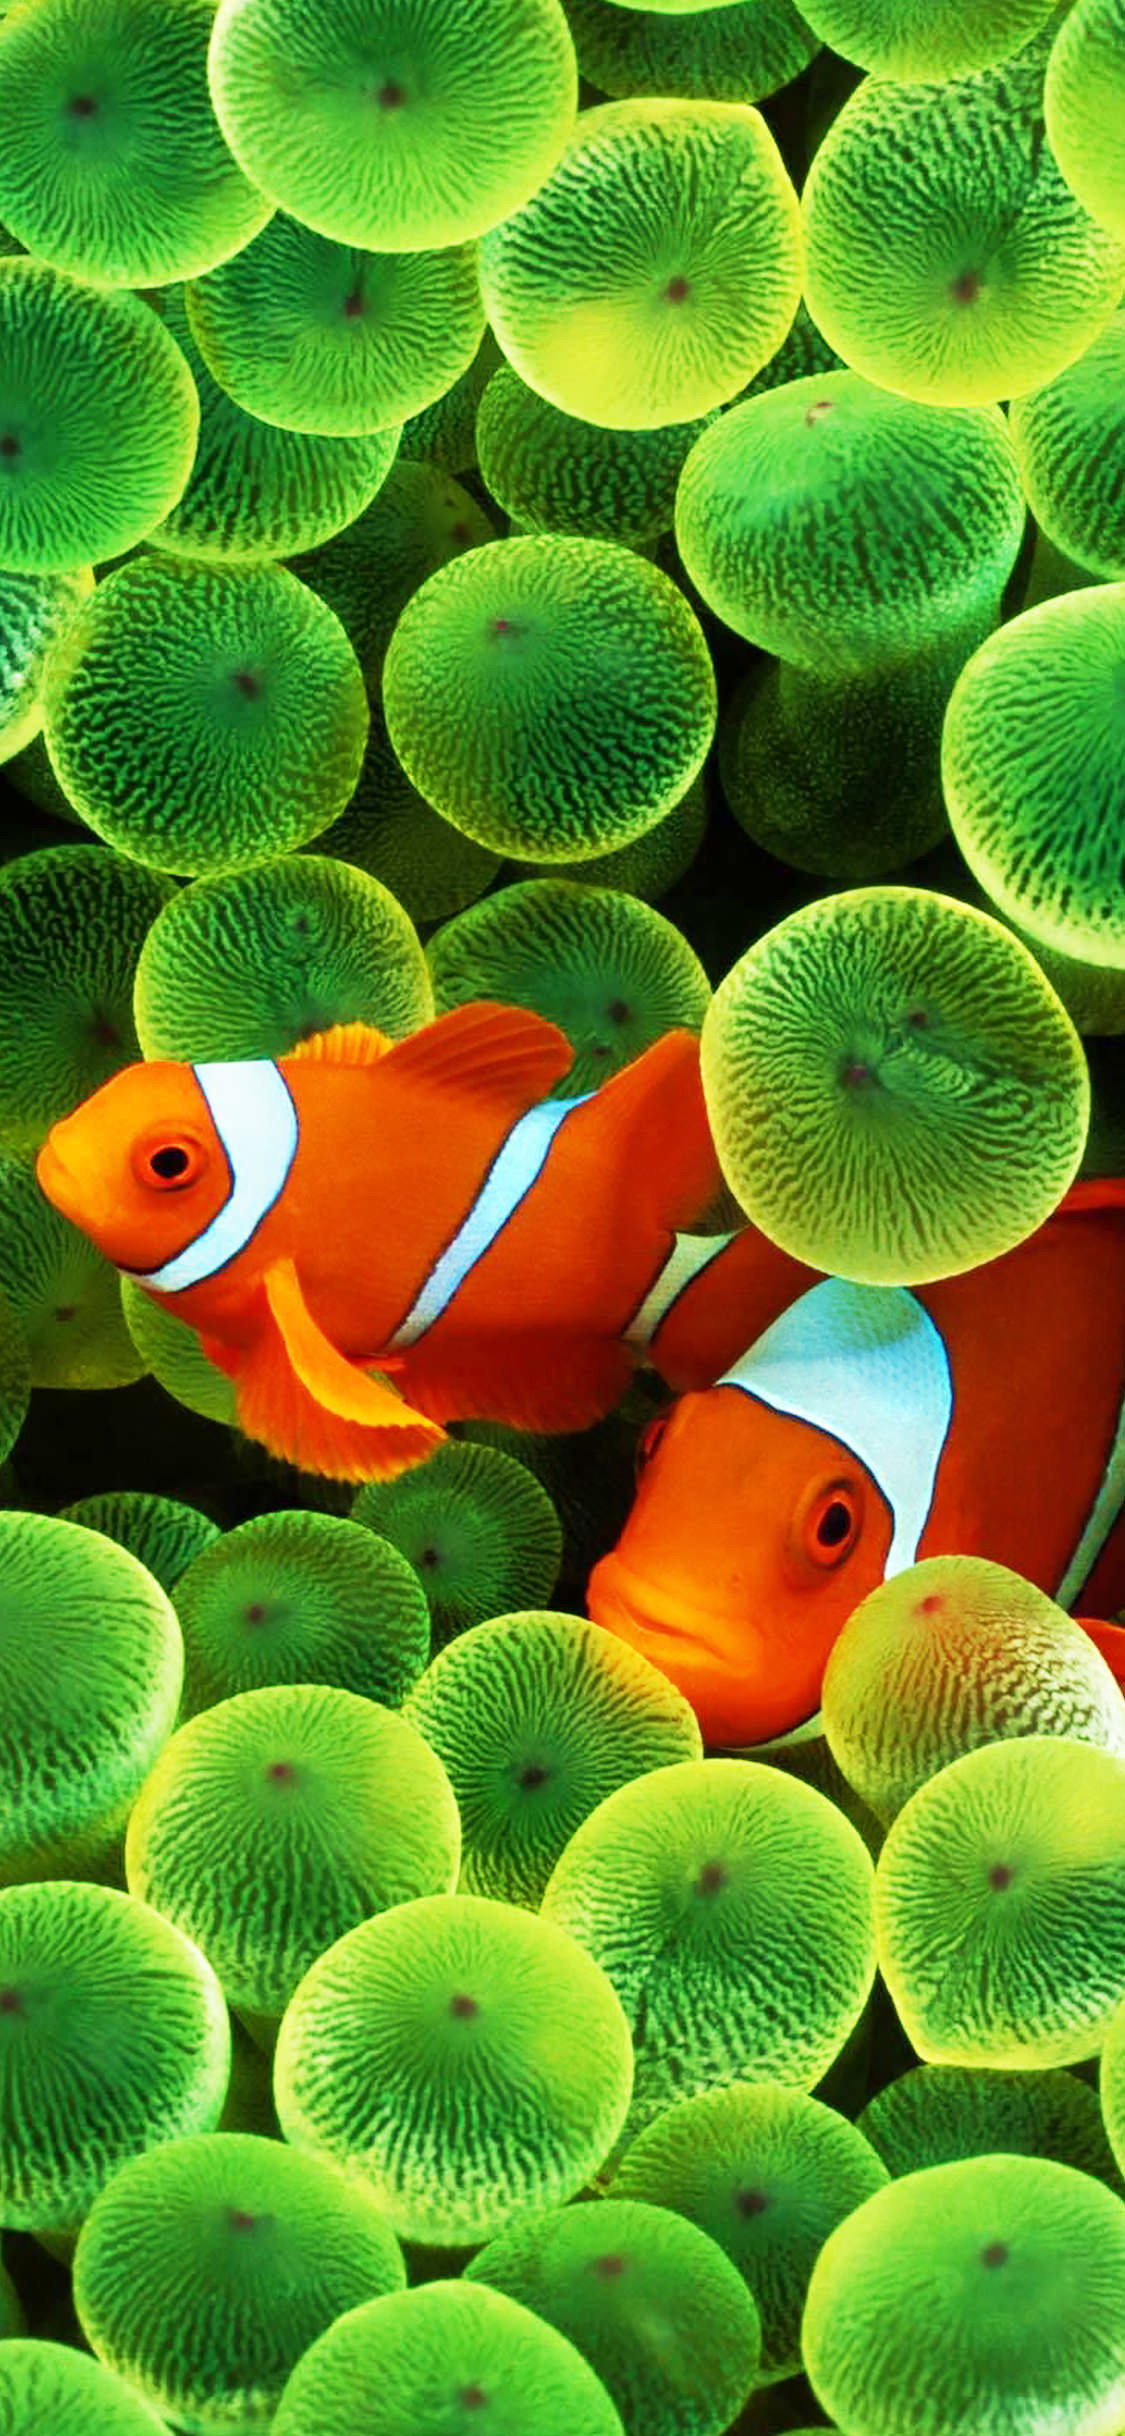 Nemo Wallpaper Iphone X Clown Fish Wallpaper 183 ① Wallpapertag